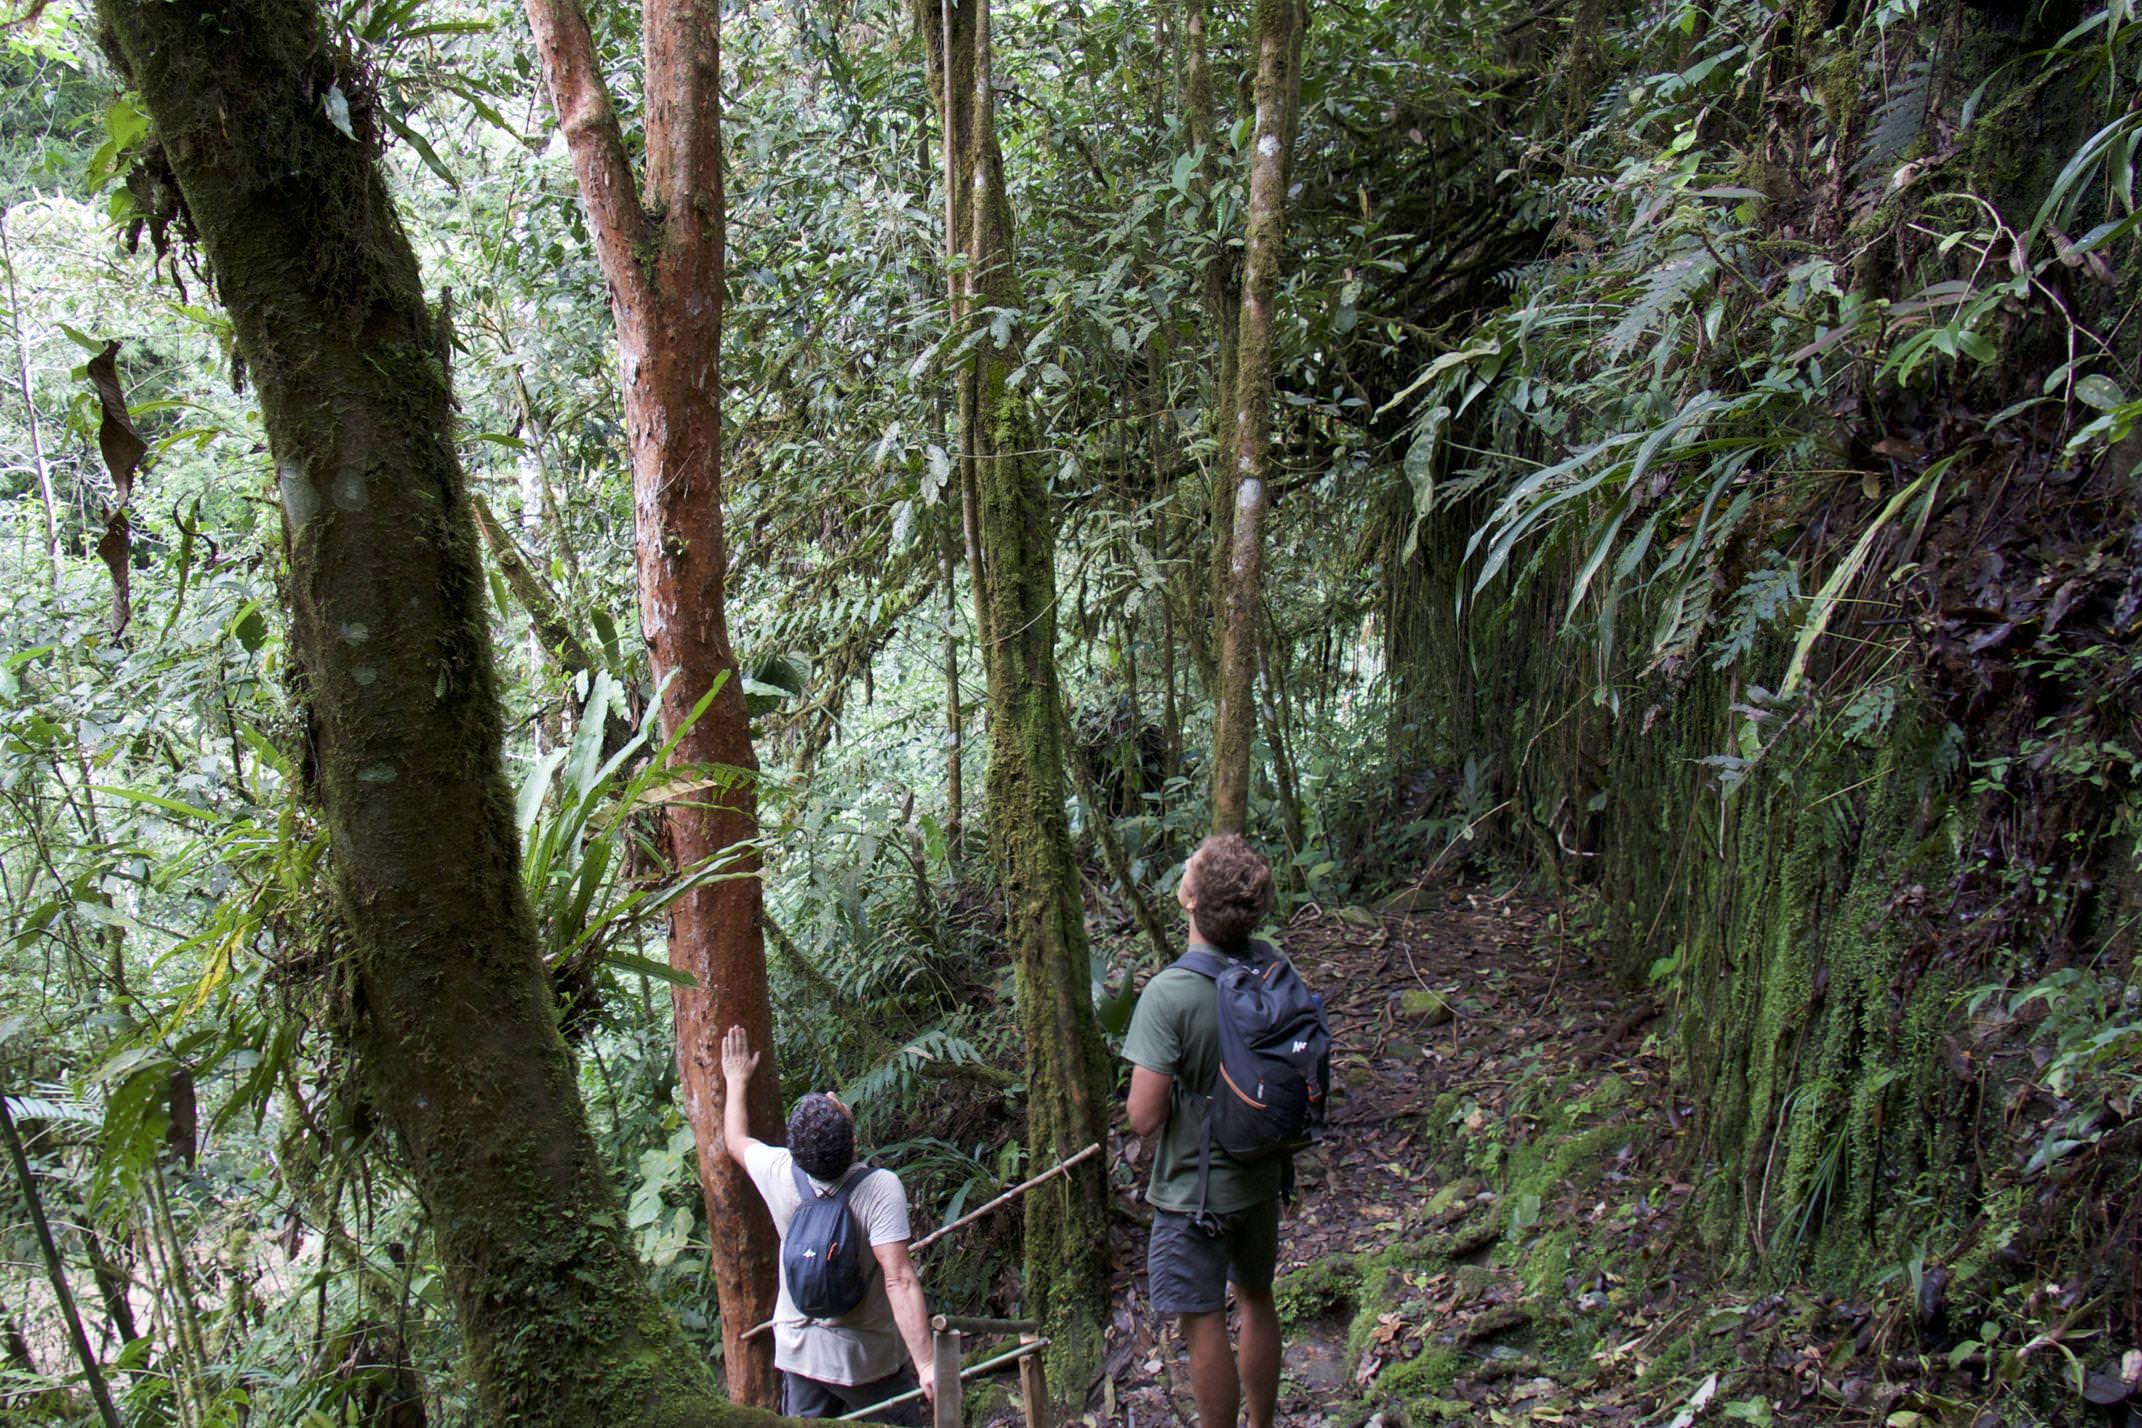 Costa rica san gerardo rivas chirripo cloudbridge looking up at tall trees